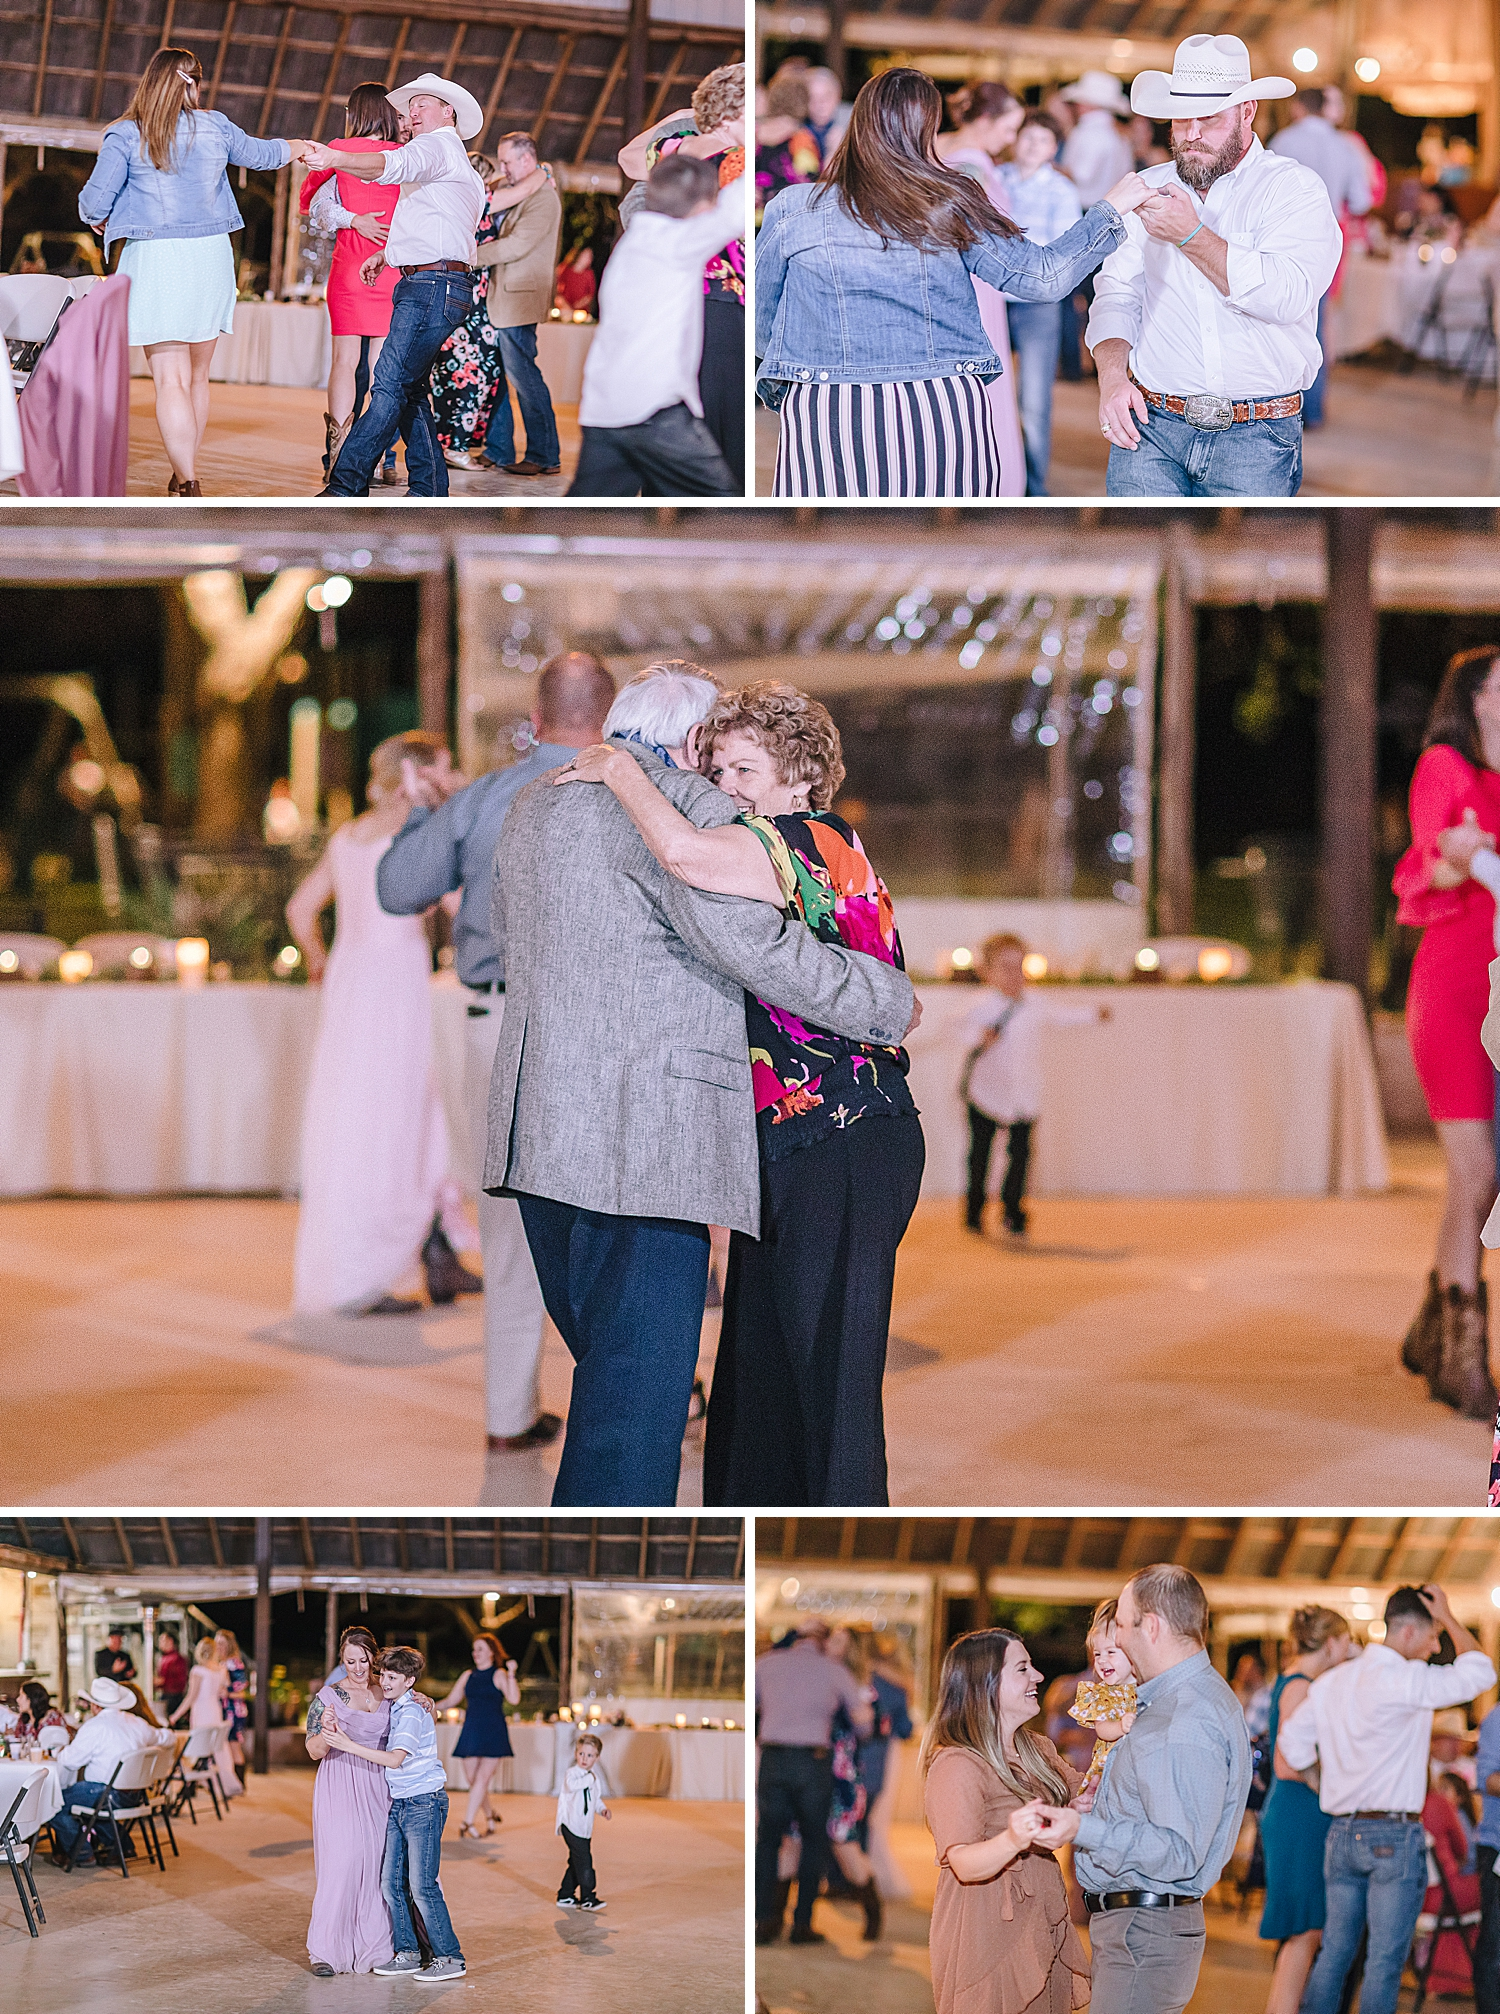 Rio-Cibilo-Ranch-Marion-Texas-Wedding-Rustic-Blush-Rose-Quartz-Details-Carly-Barton-Photography_0099.jpg